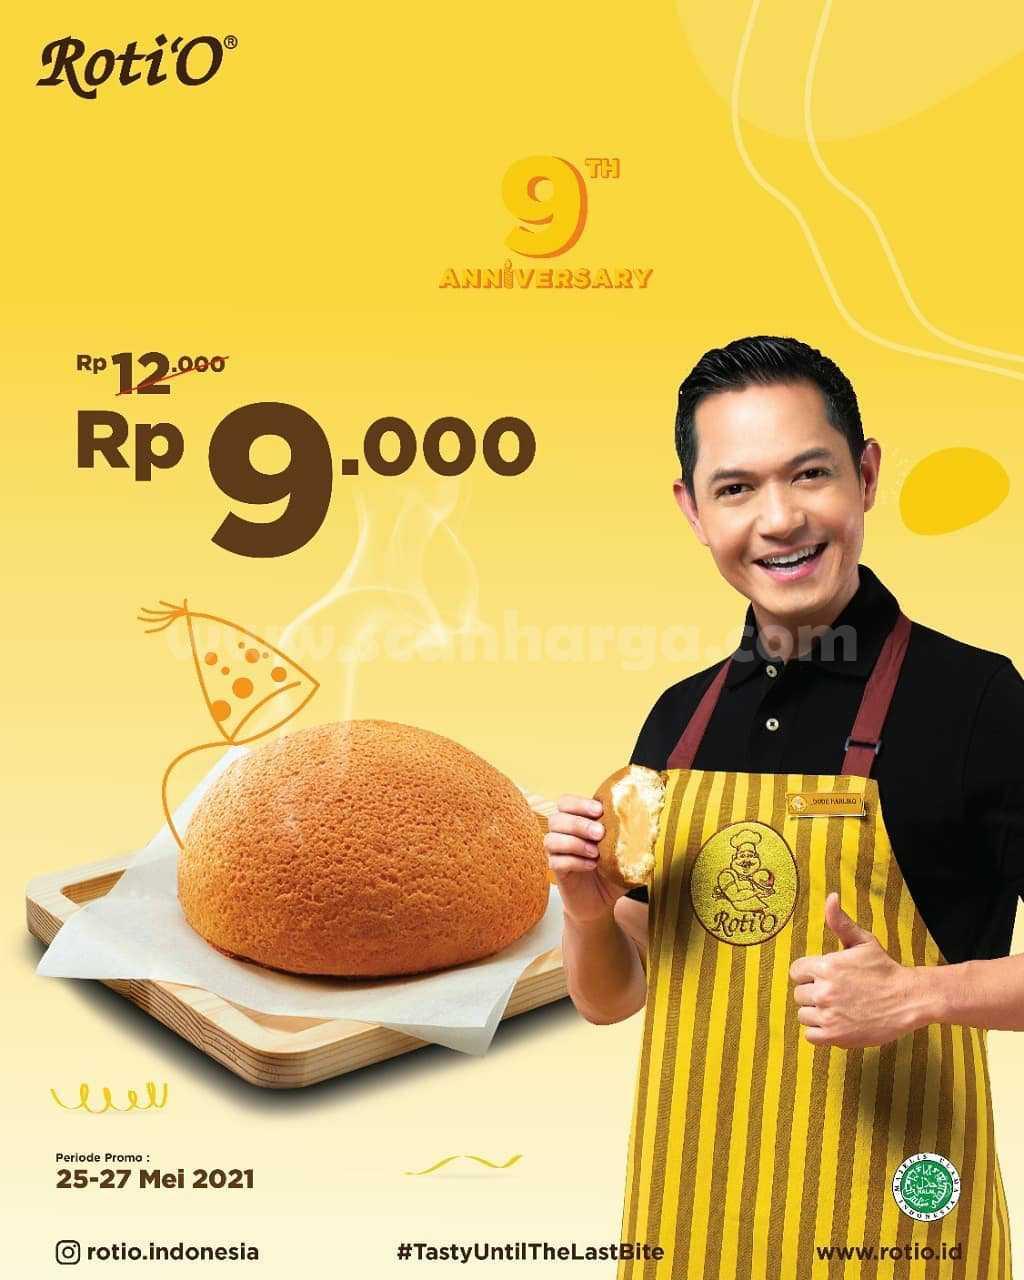 Promo RotiO 9th Anniversary! Harga Spesial ROTI O hanya Rp 9.000